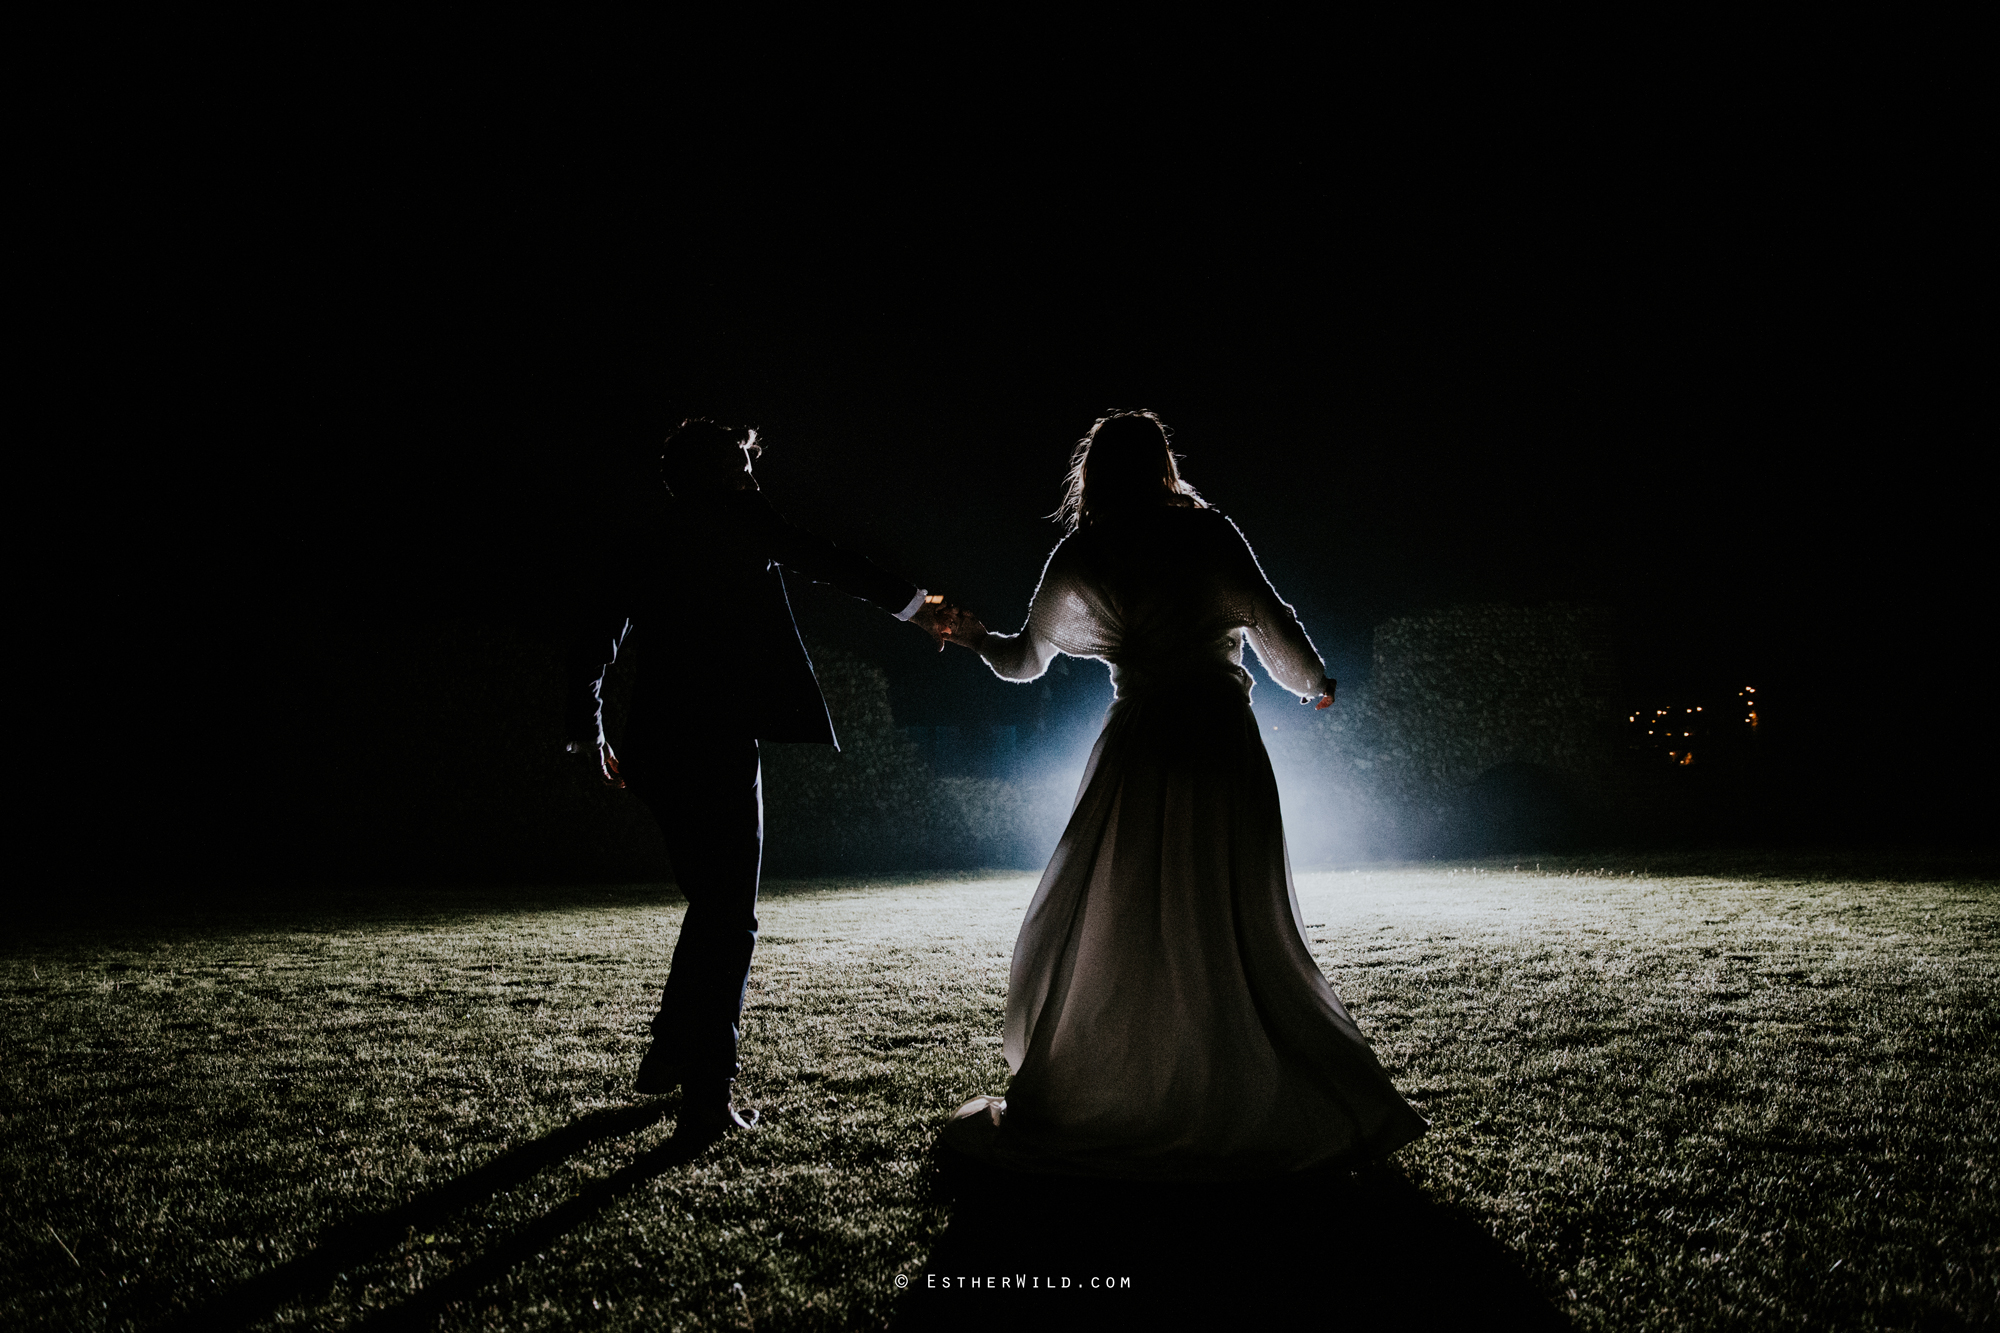 Barn_Drift_Wedding_Photographer_Norfolk_UK_IMG_3681Cley_Barn_Drift_Norfolk_Coast_Wedding_Copyright_Esther_Wild_Photographer_.jpg